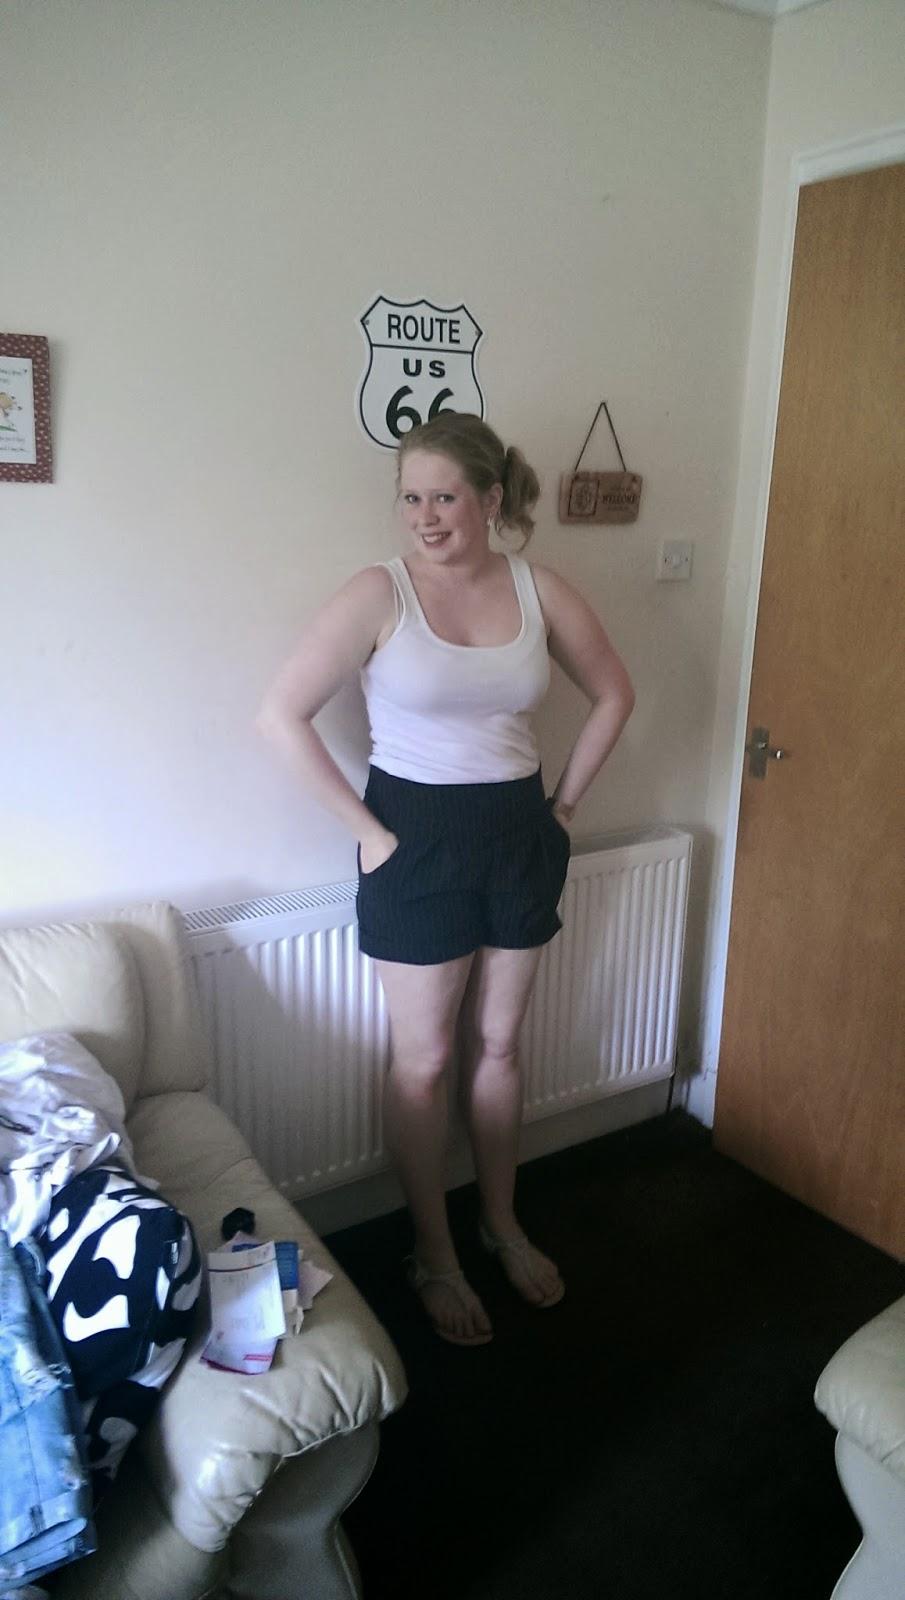 http://jennifercatherineshaw.blogspot.com/2014/06/completed-chataigne-shorts-number-2.html